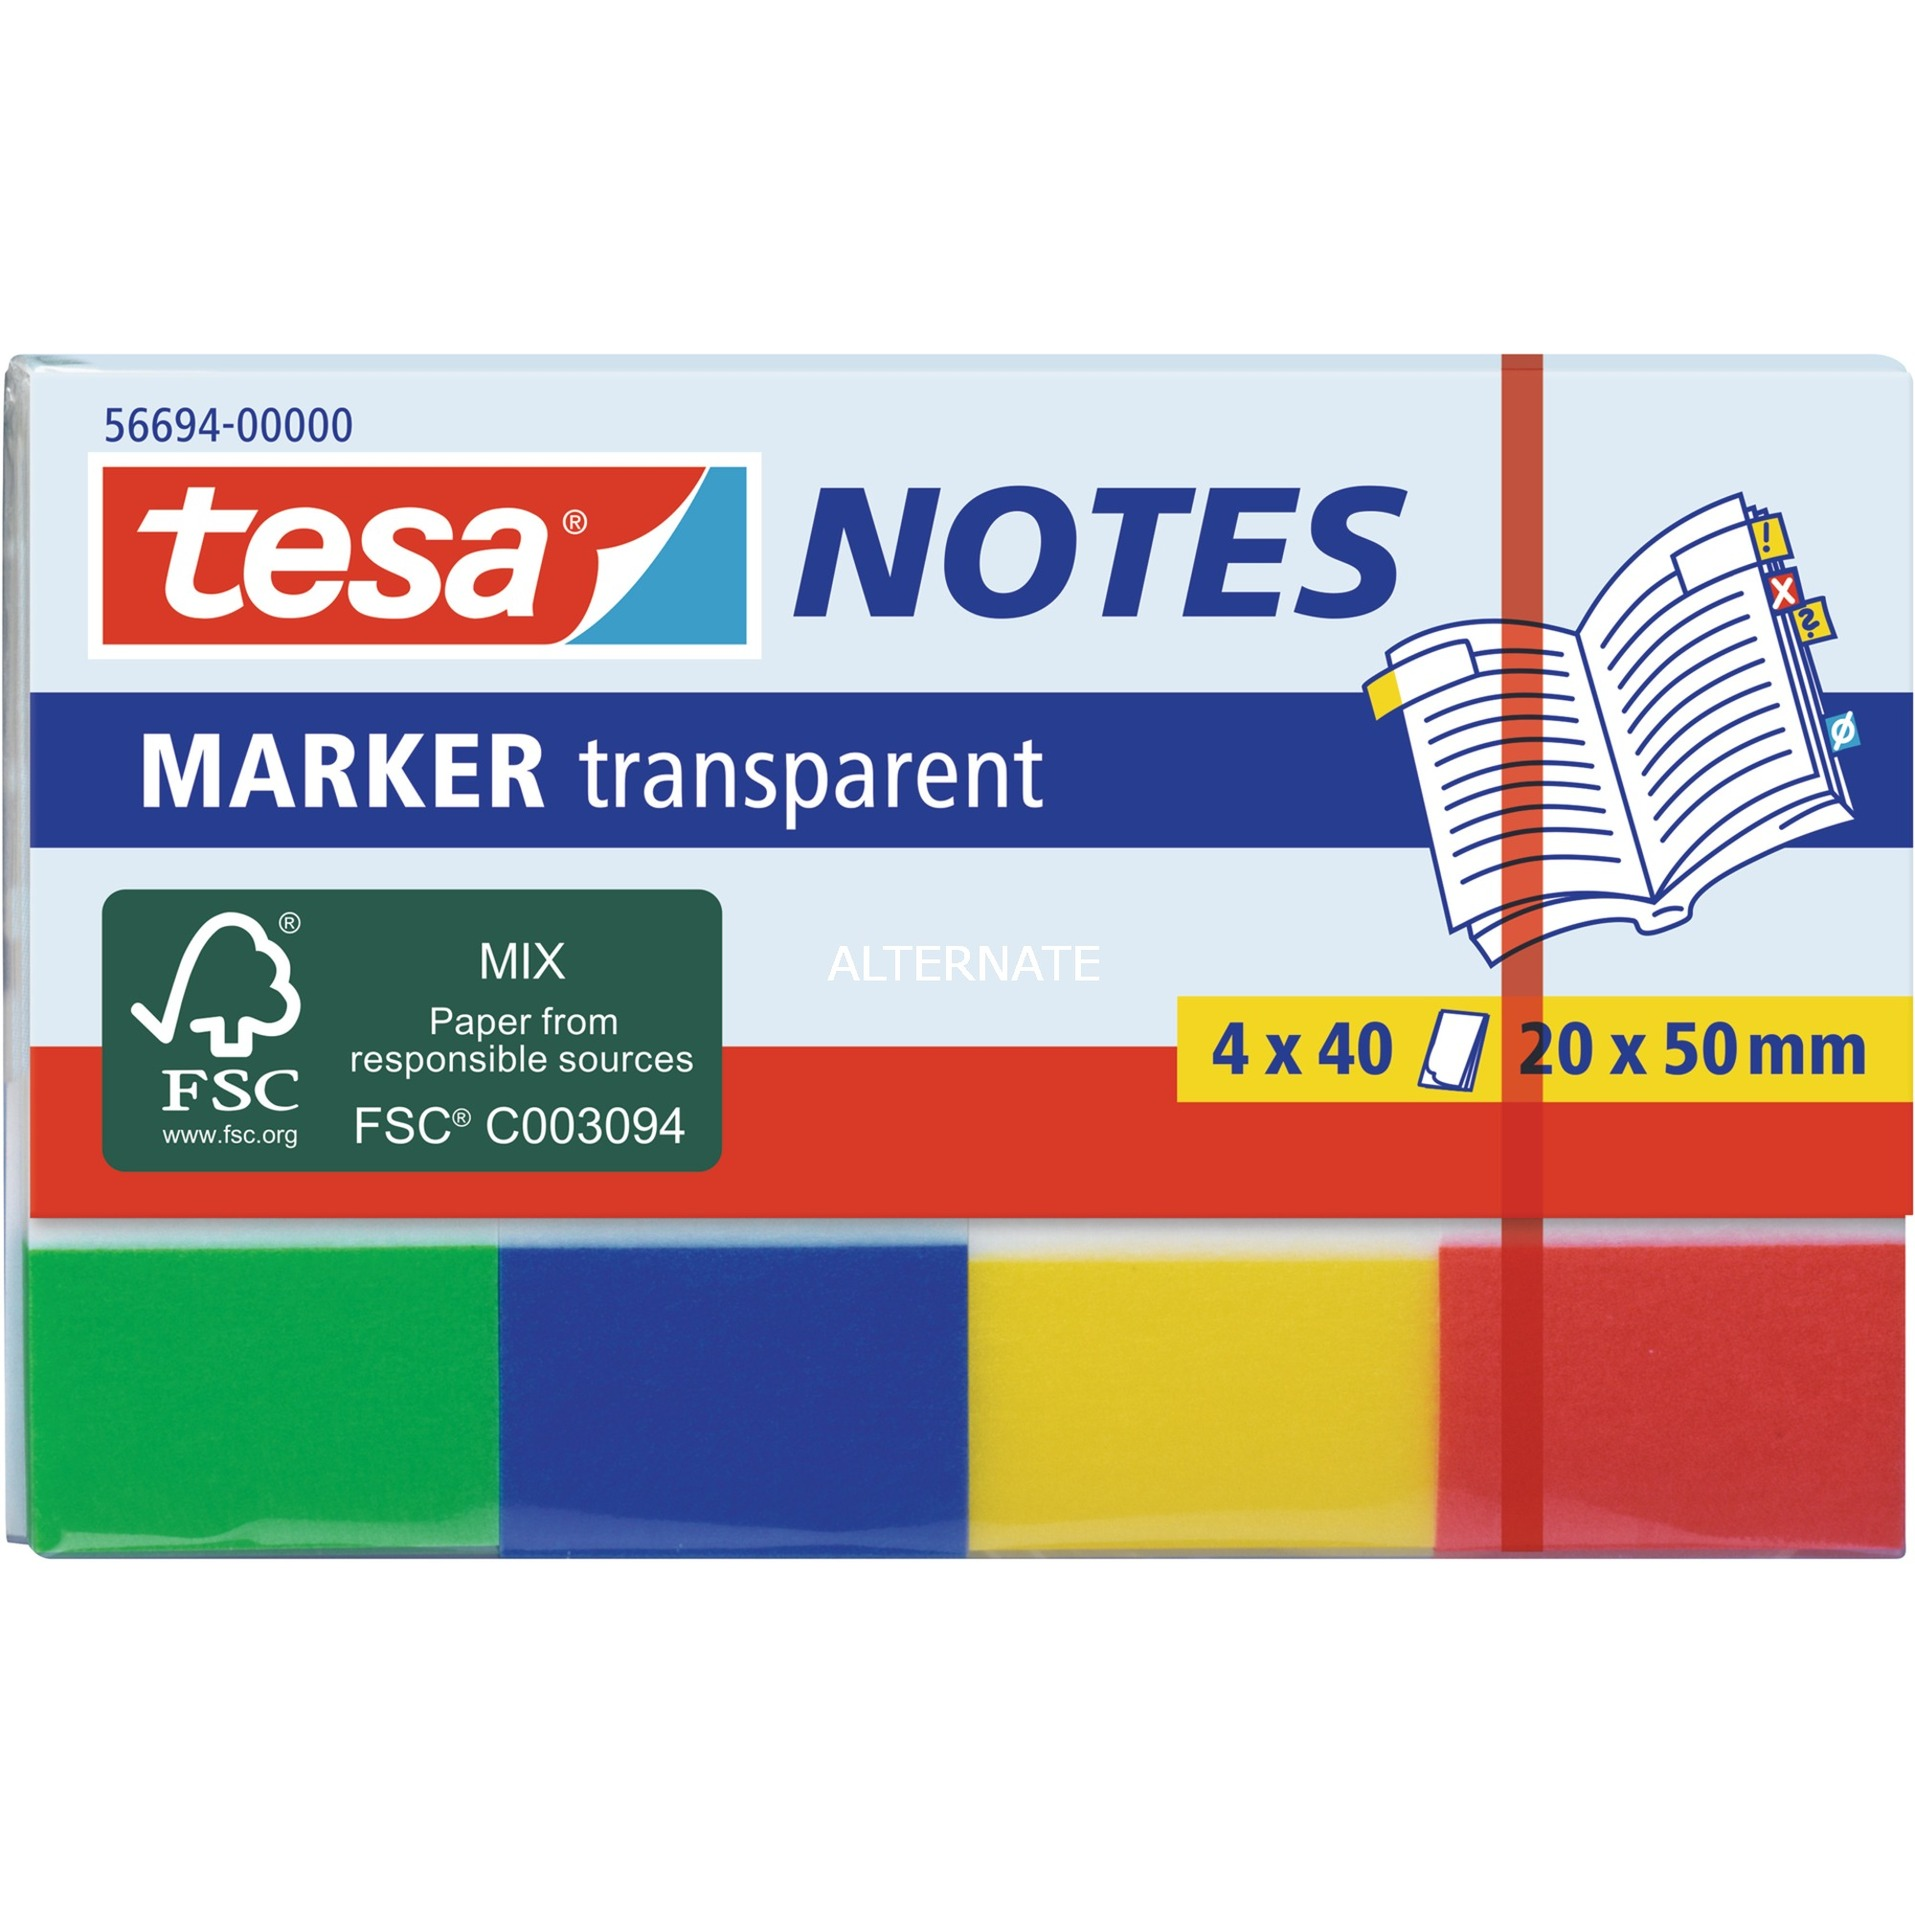 Image of Marker Notes transparent, 4 x 40 Blatt, Aufkleber